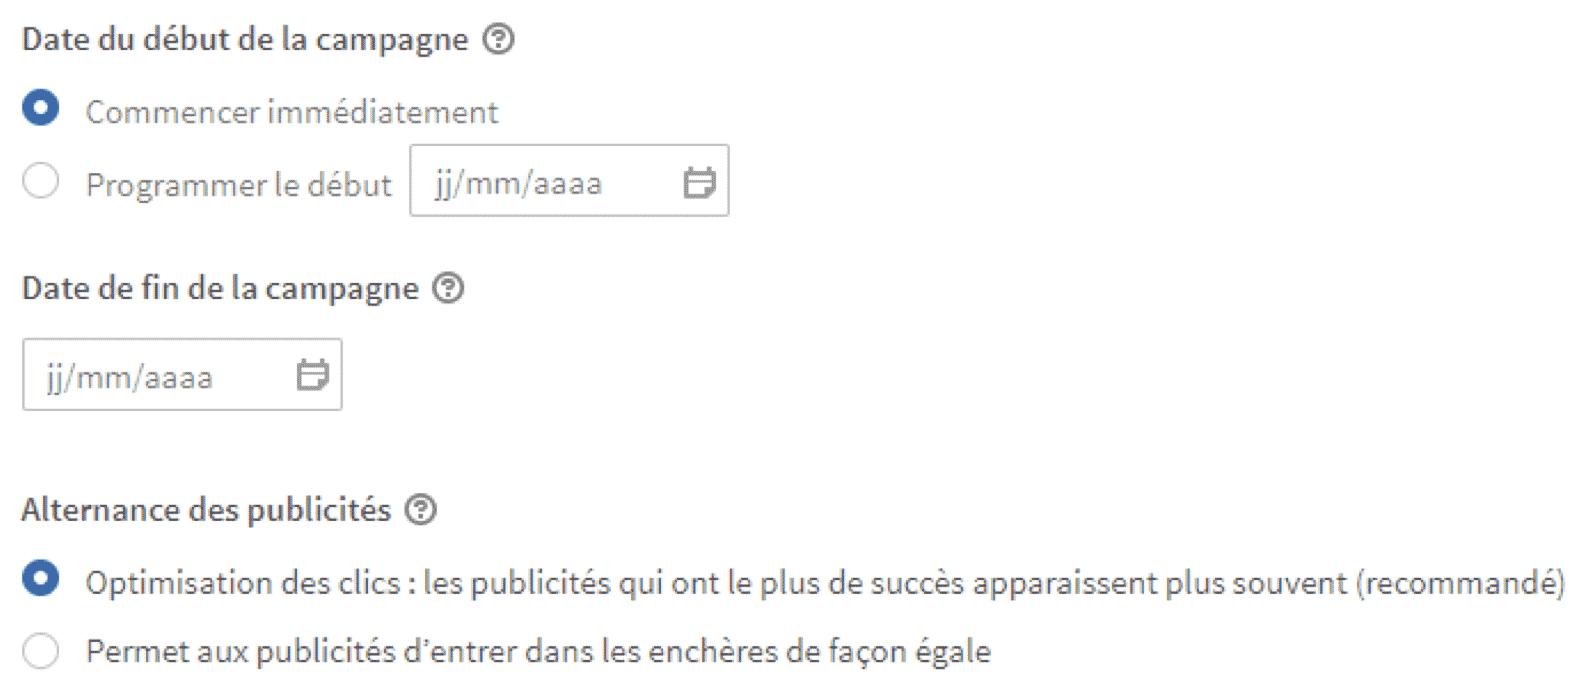 dates-campagnes-pub-linkedin